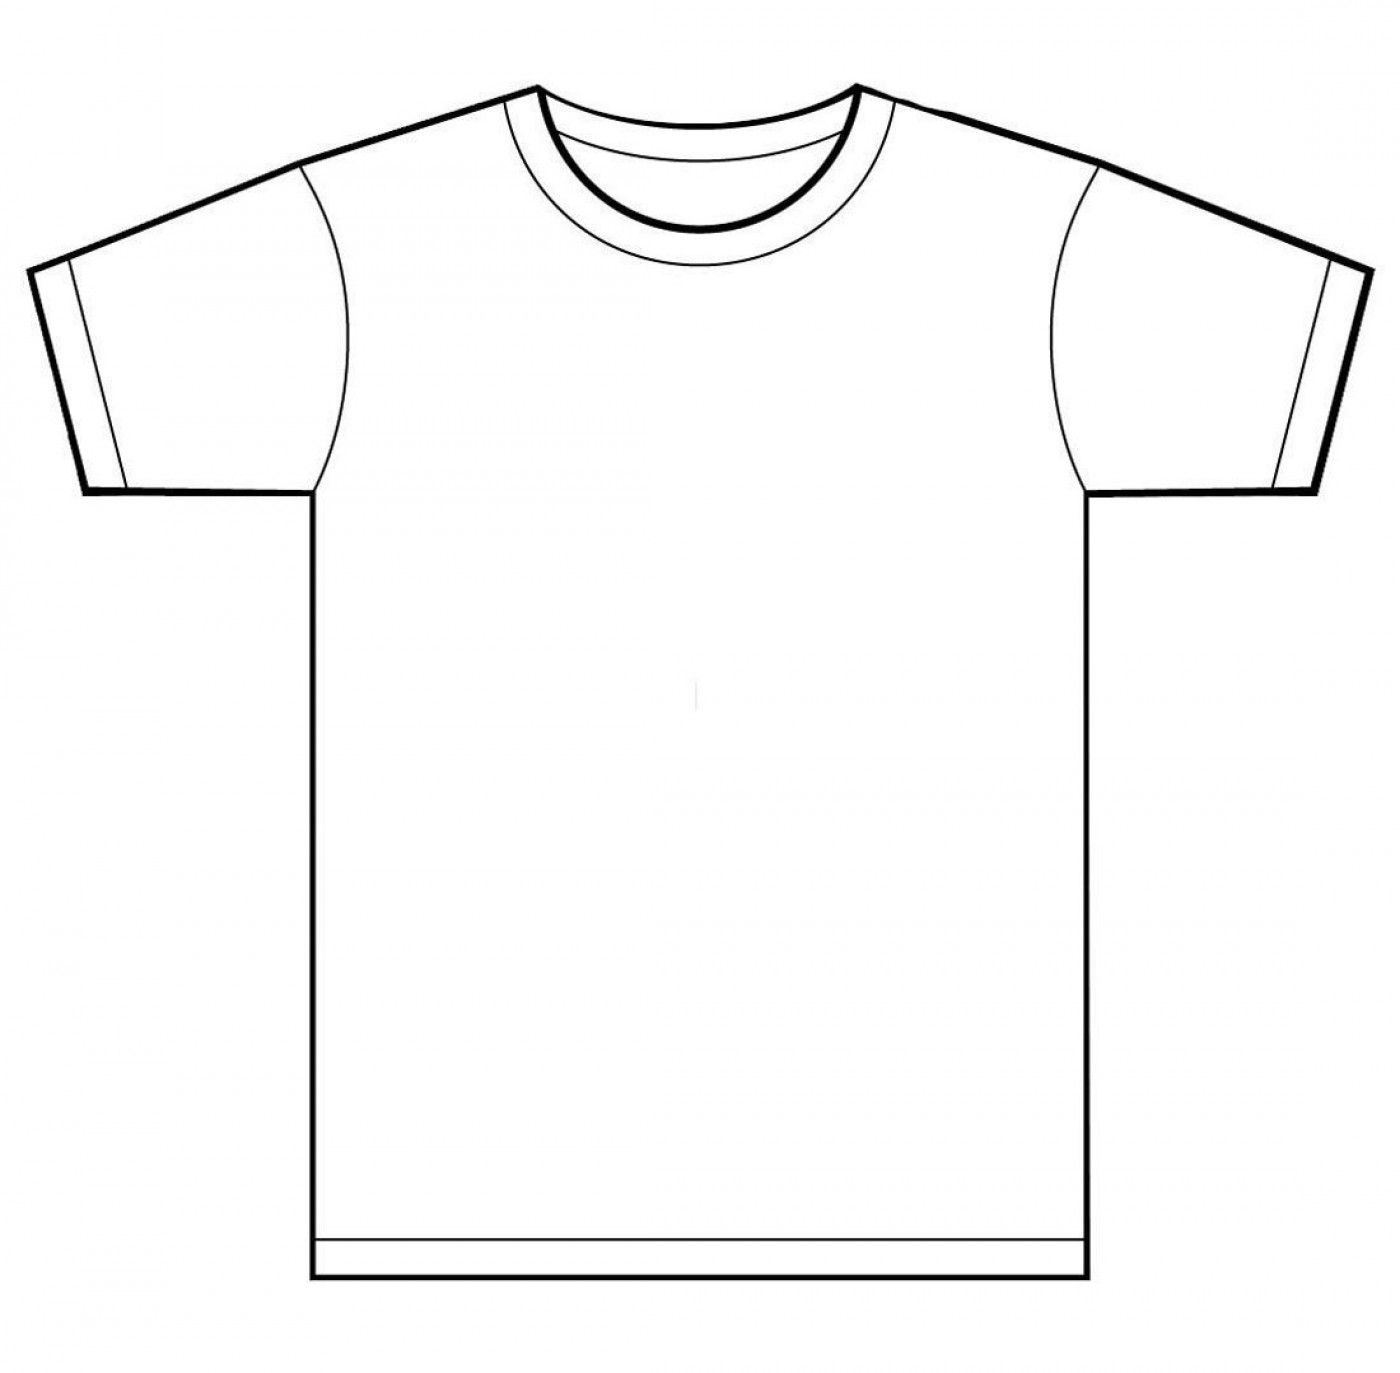 001 Unusual T Shirt Template Free Sample  Polo T-shirt Illustrator Download Website Editable Design1400